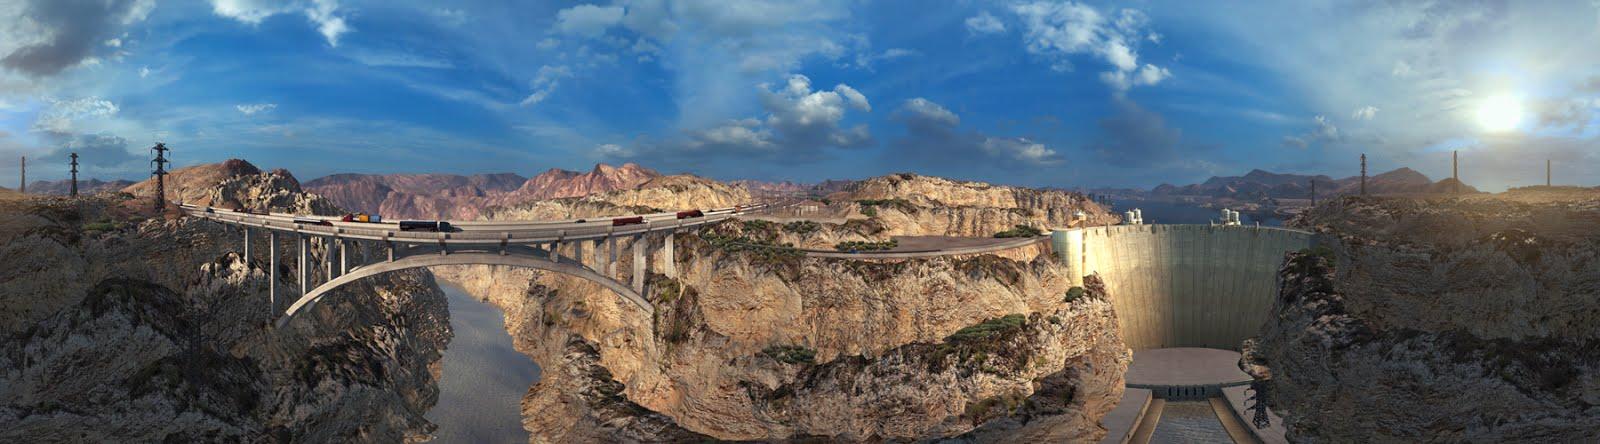 Arizona rozšířila mapu American Truck Simulatoru 124953